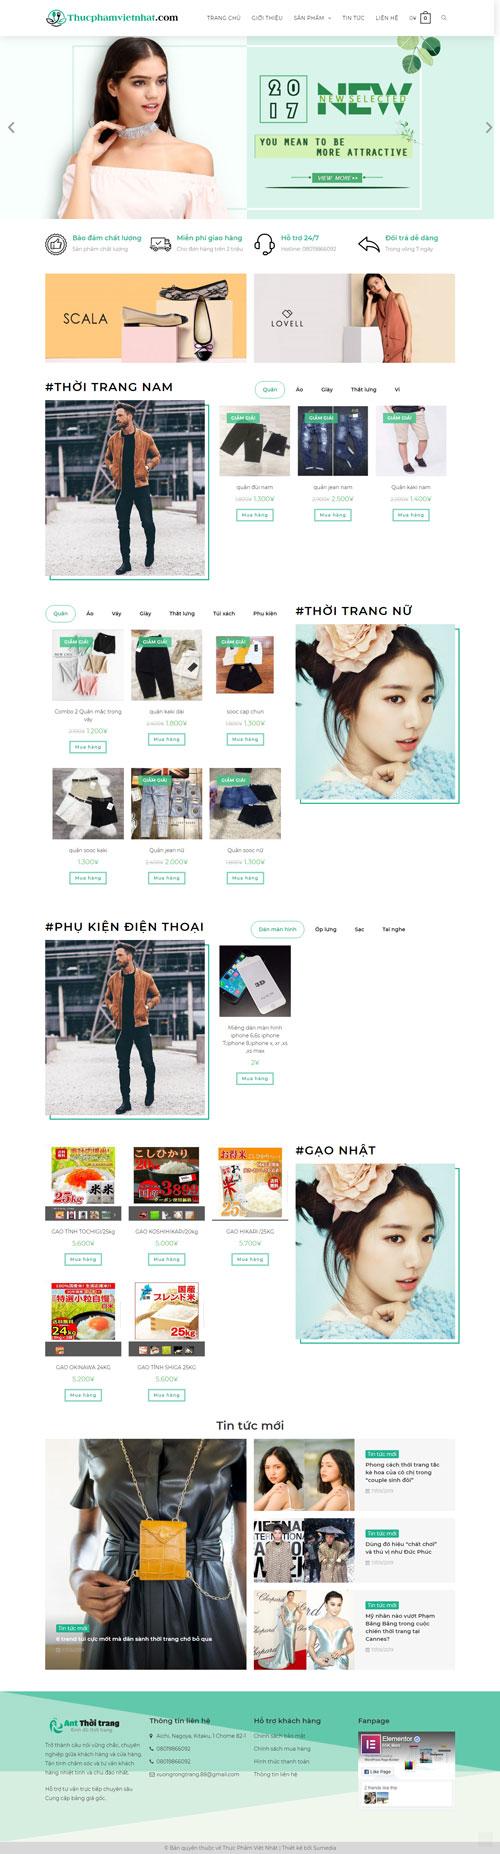 Website thời trang Việt Nhật 1